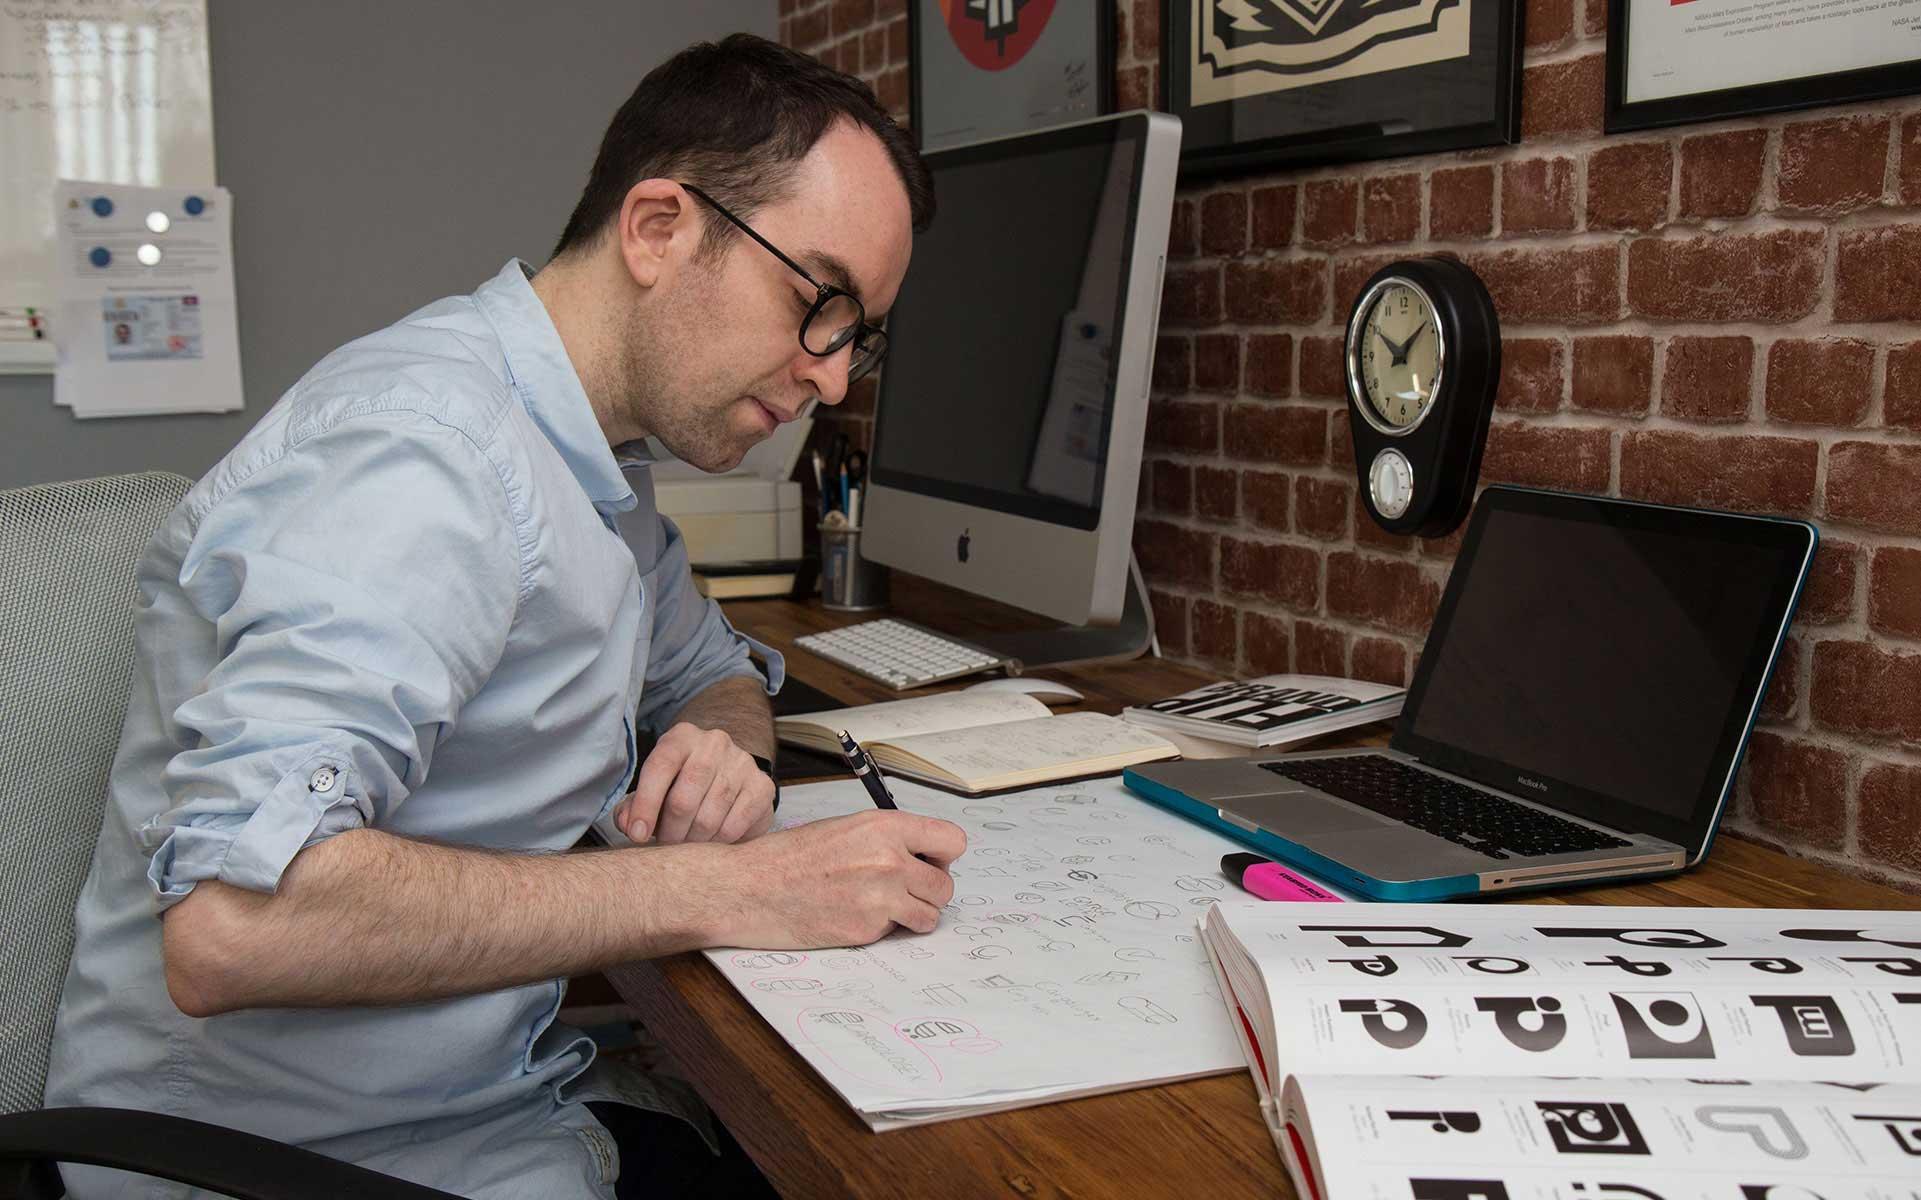 Brainstorming identity design ideas